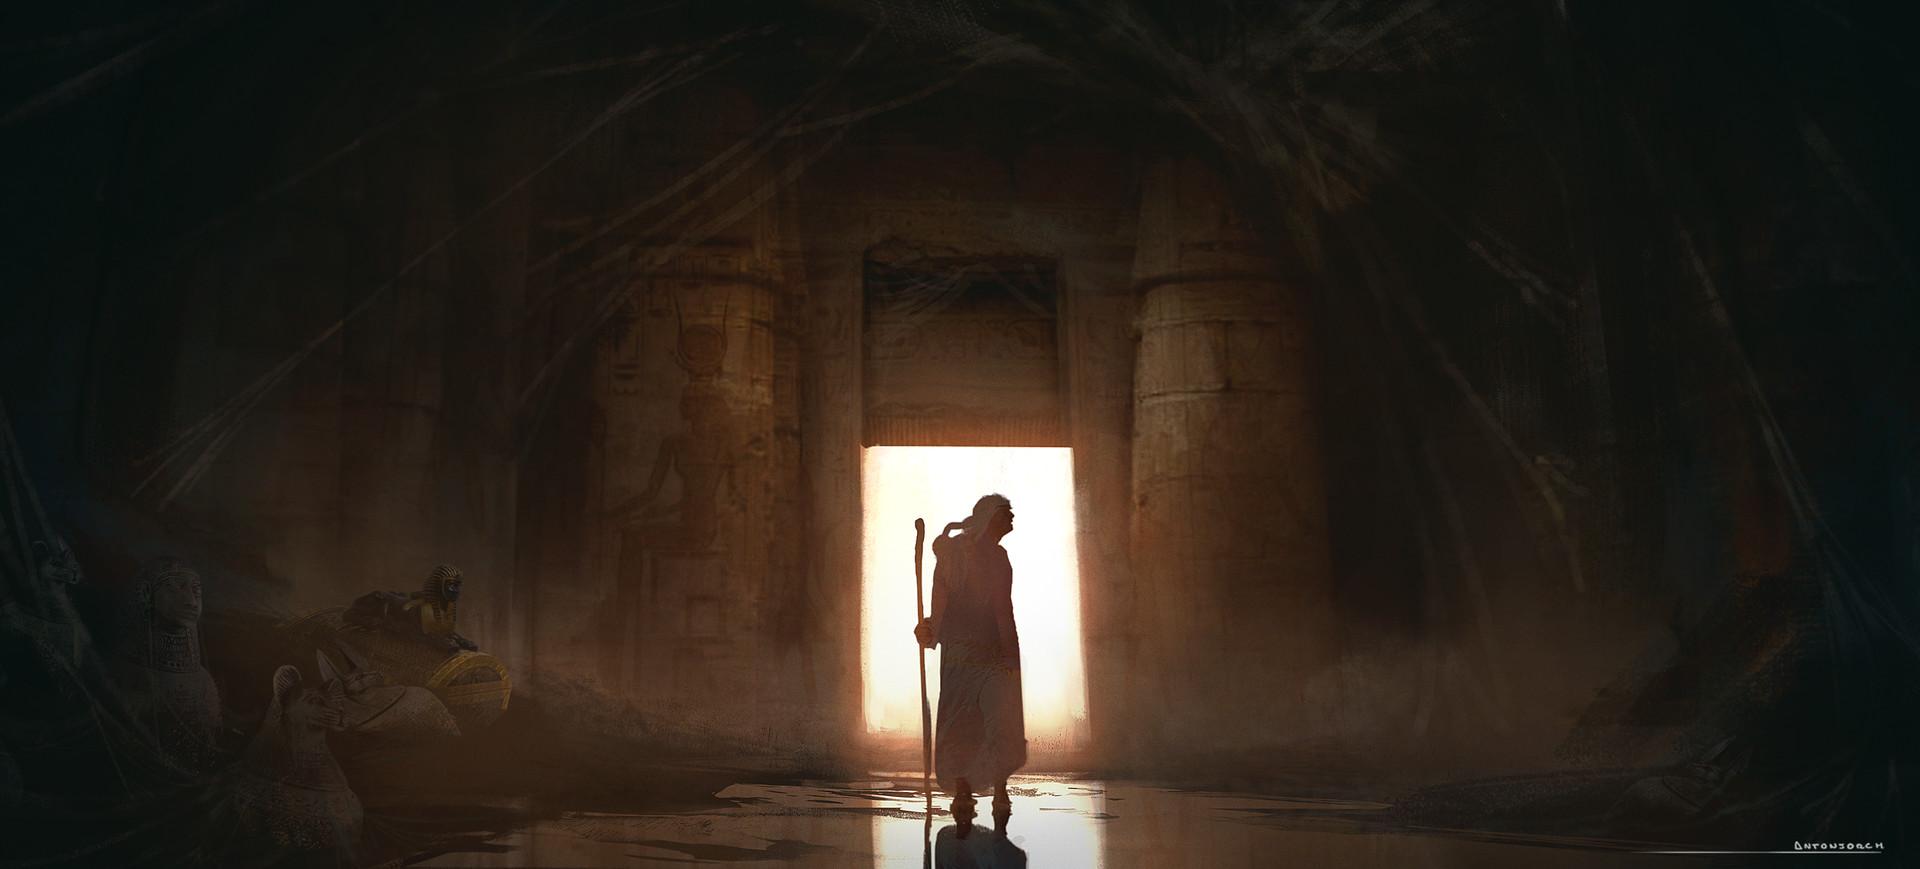 Jorge gonzalez tomb raider